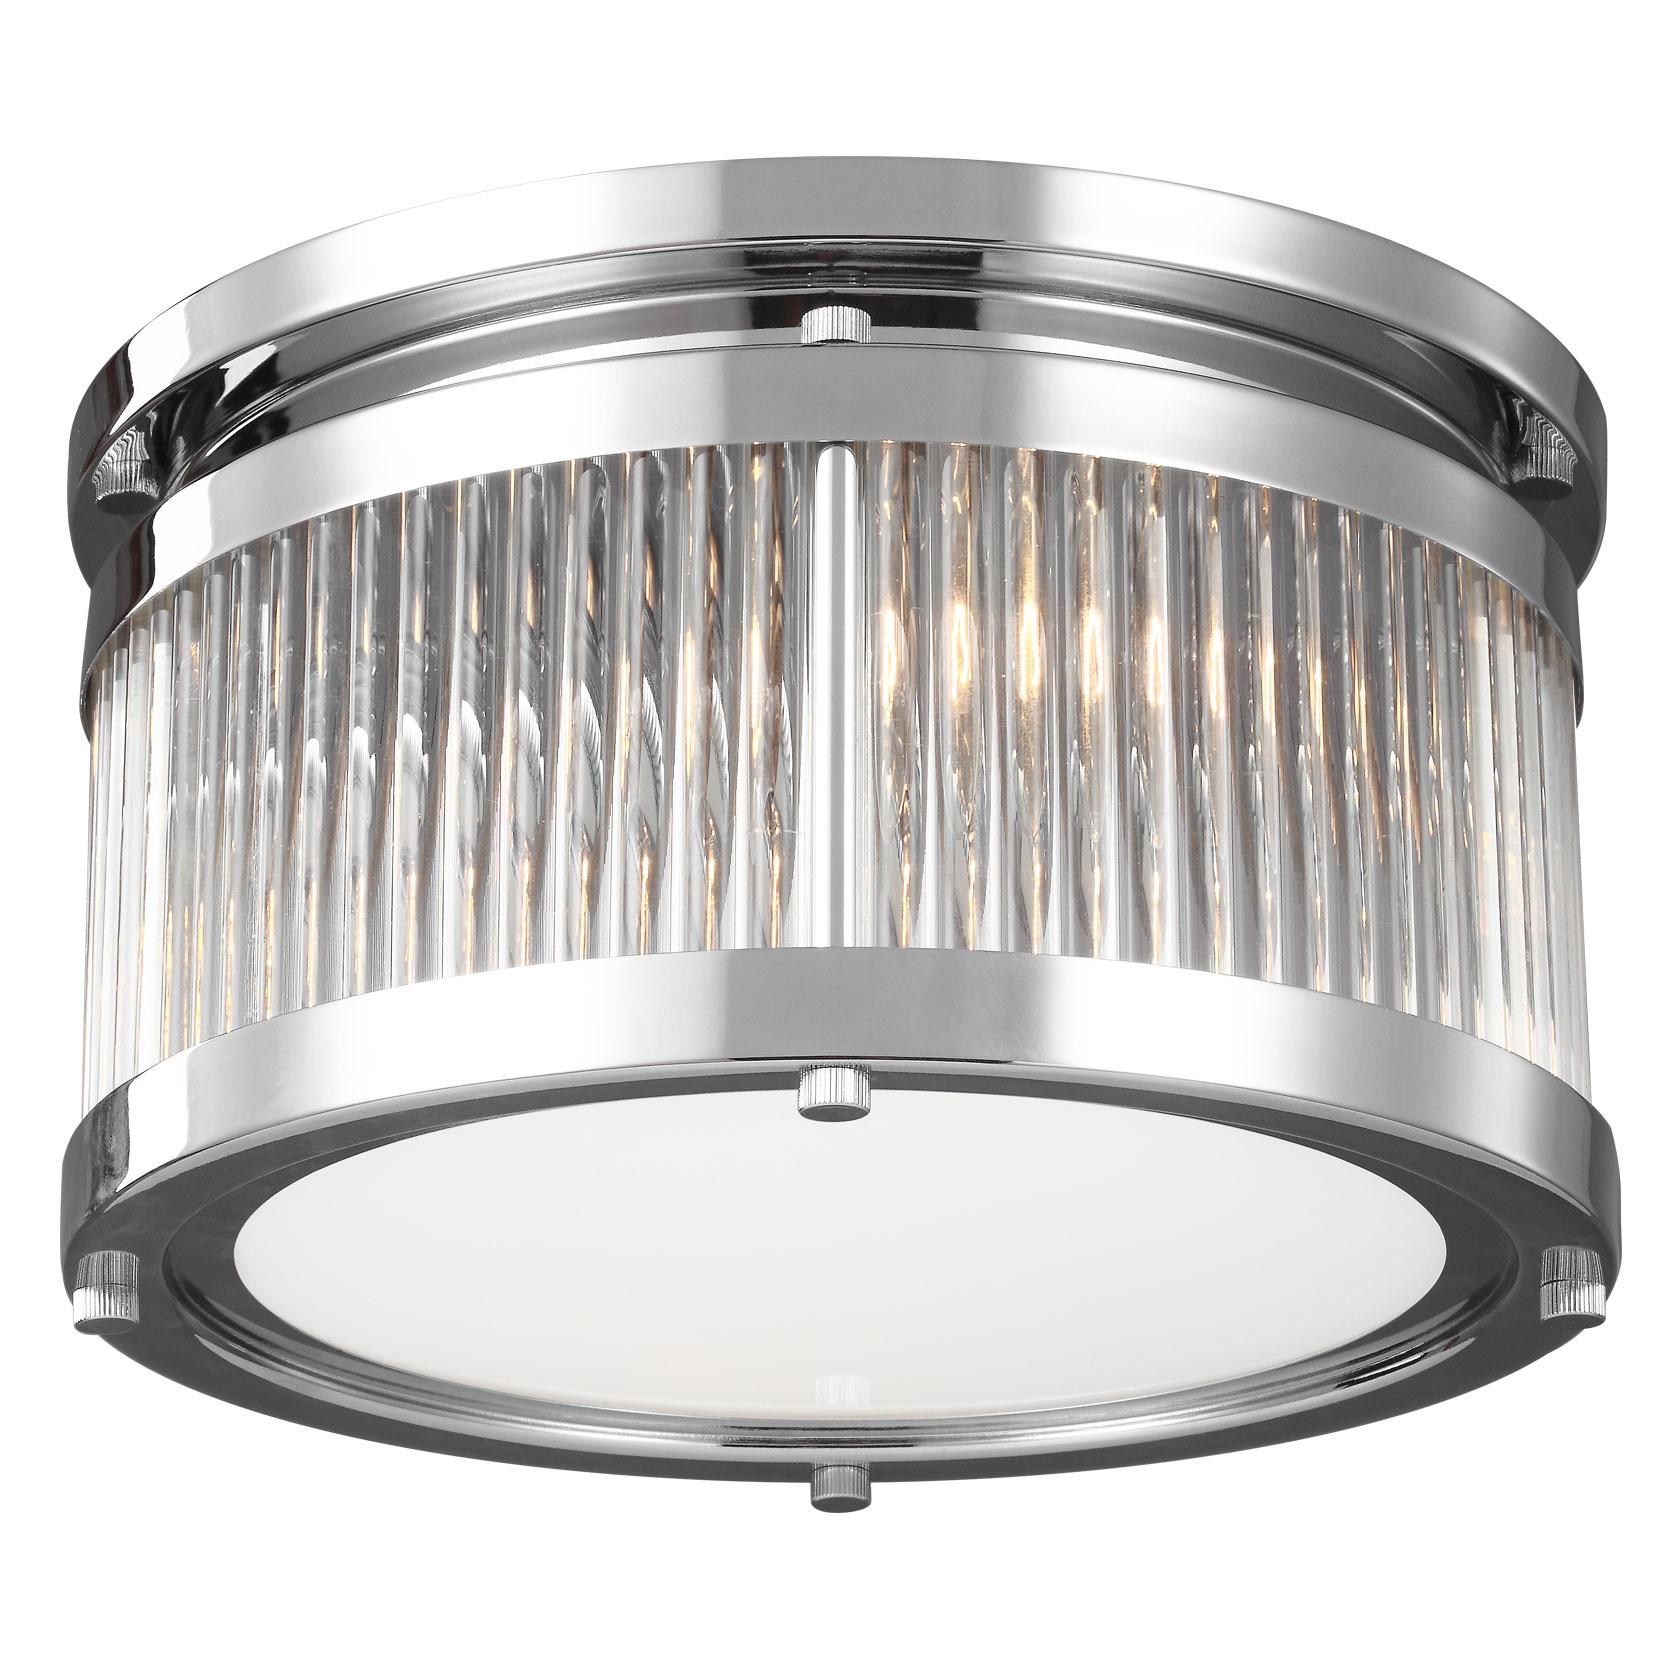 Paulson Ceiling Light Fixture by Feiss | FM516CH